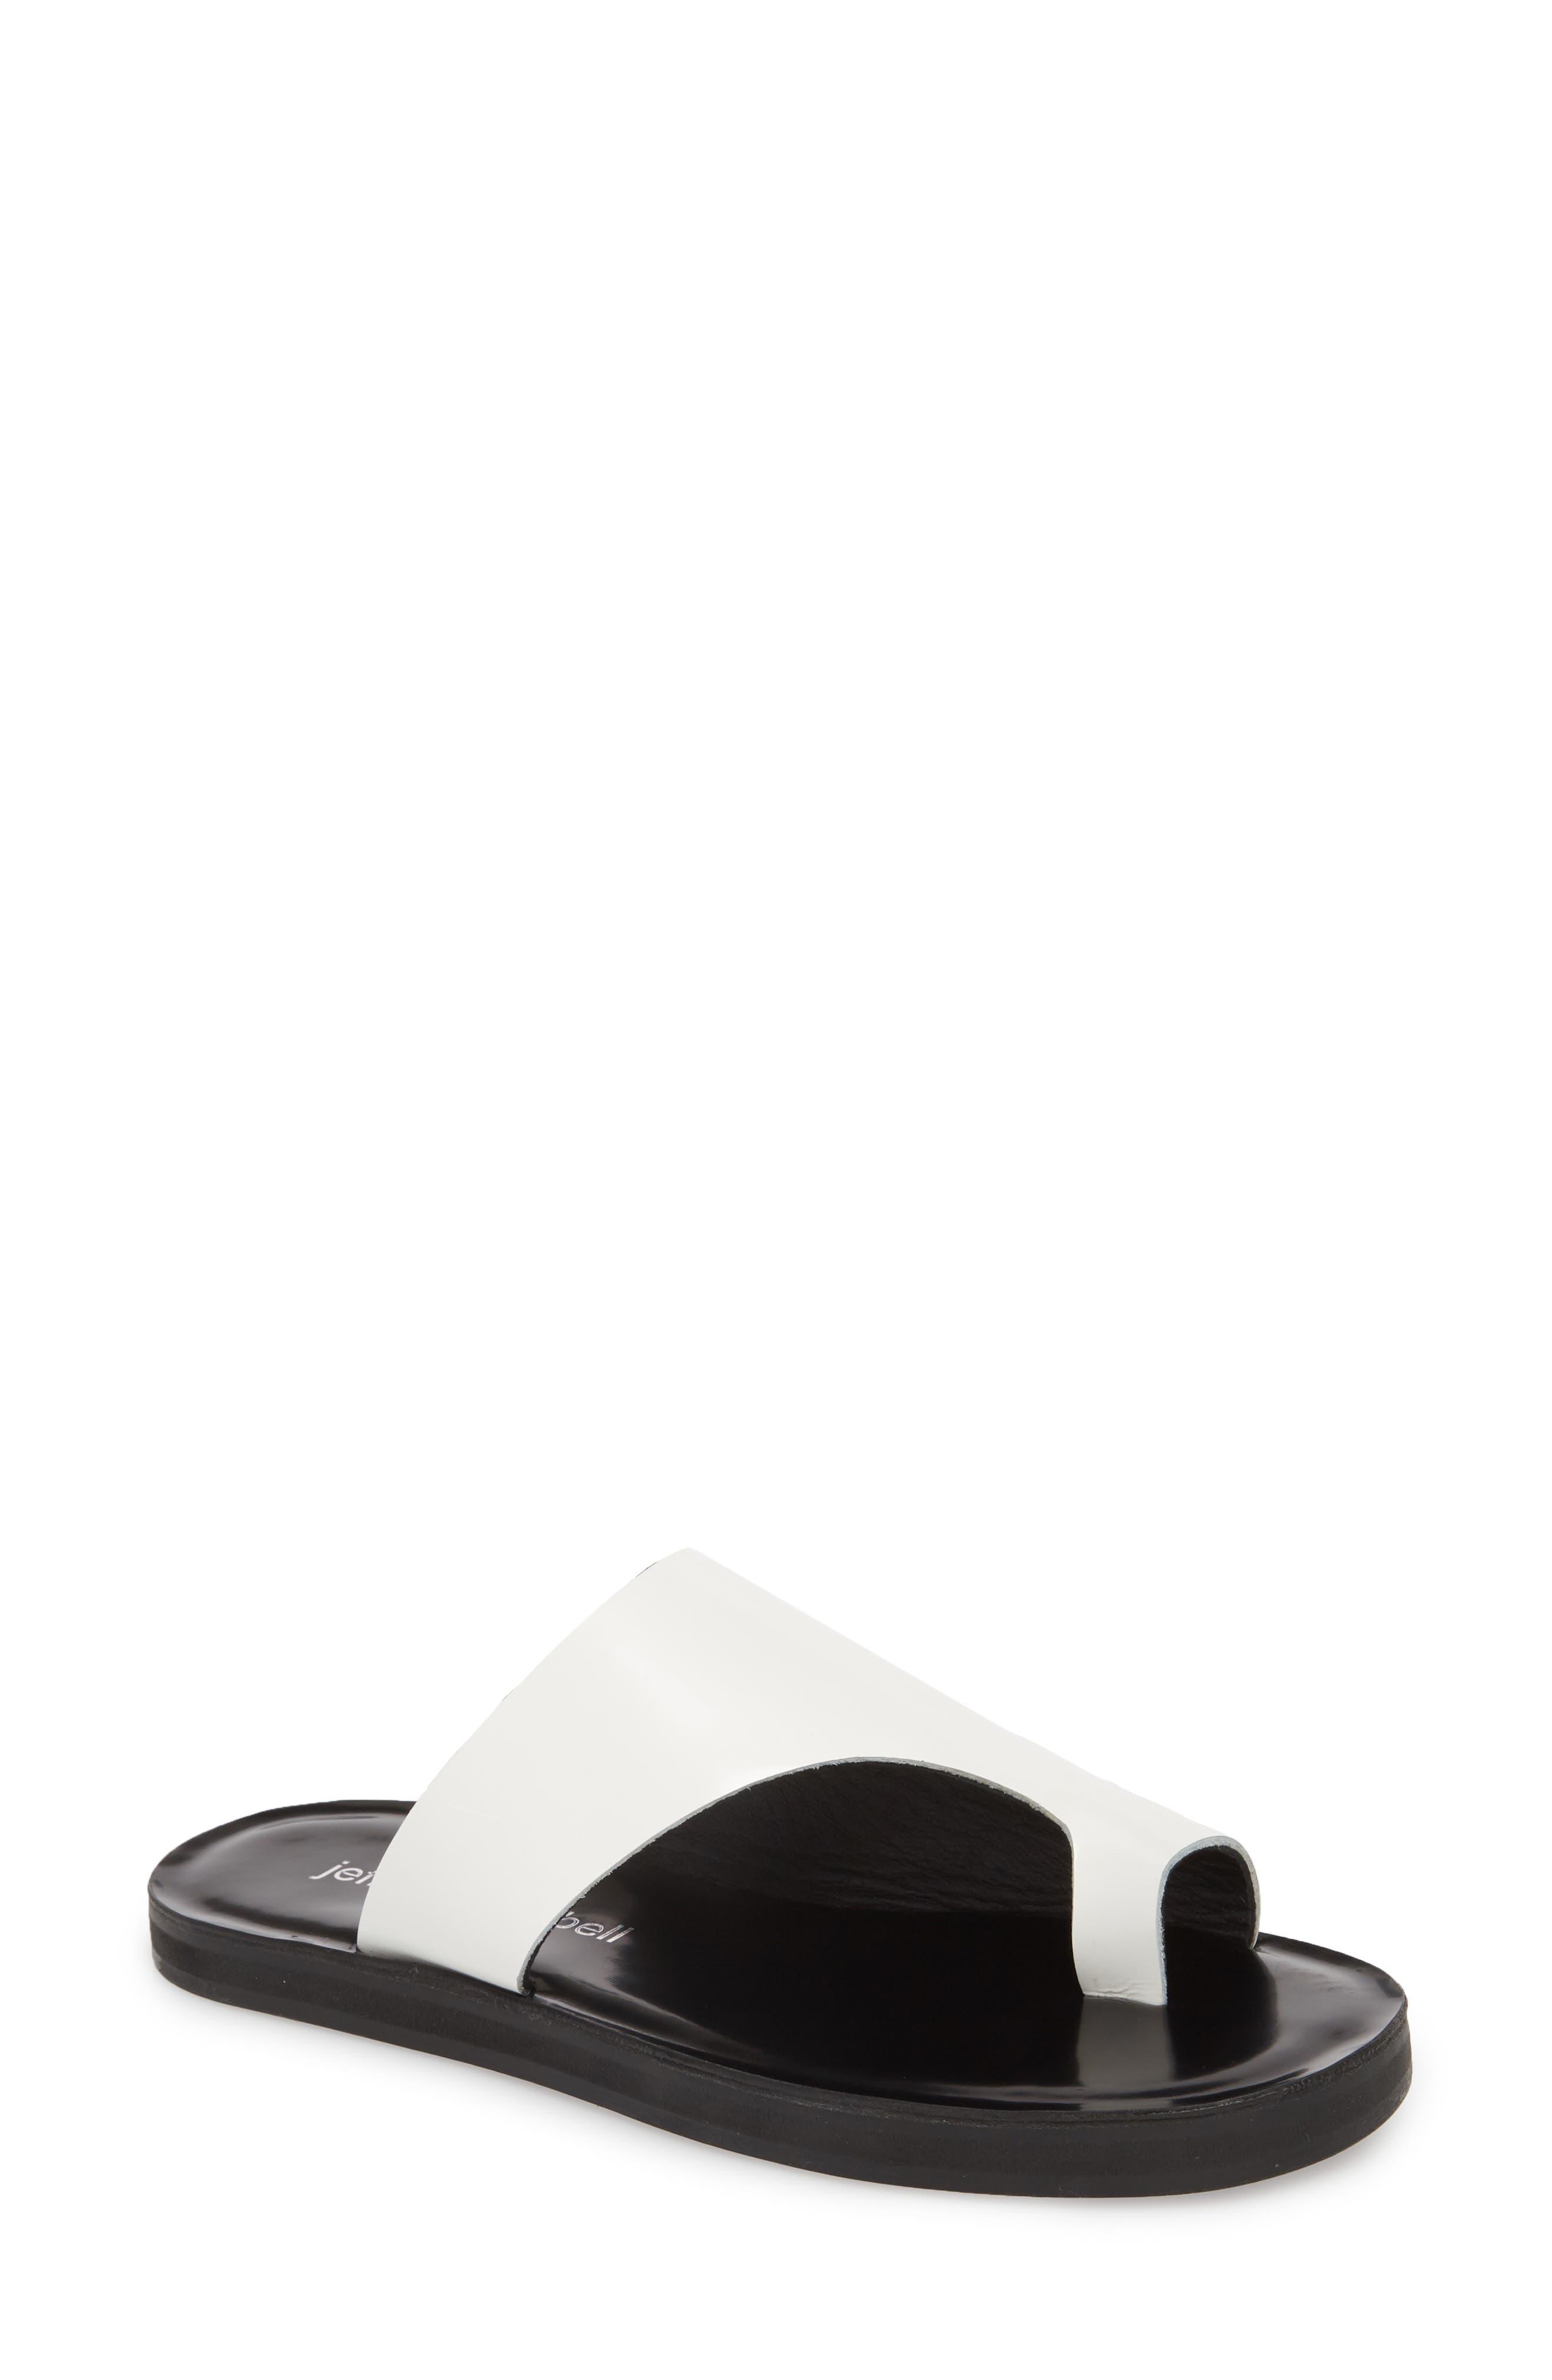 Morada Asymmetrical Slide Sandal,                         Main,                         color, 107